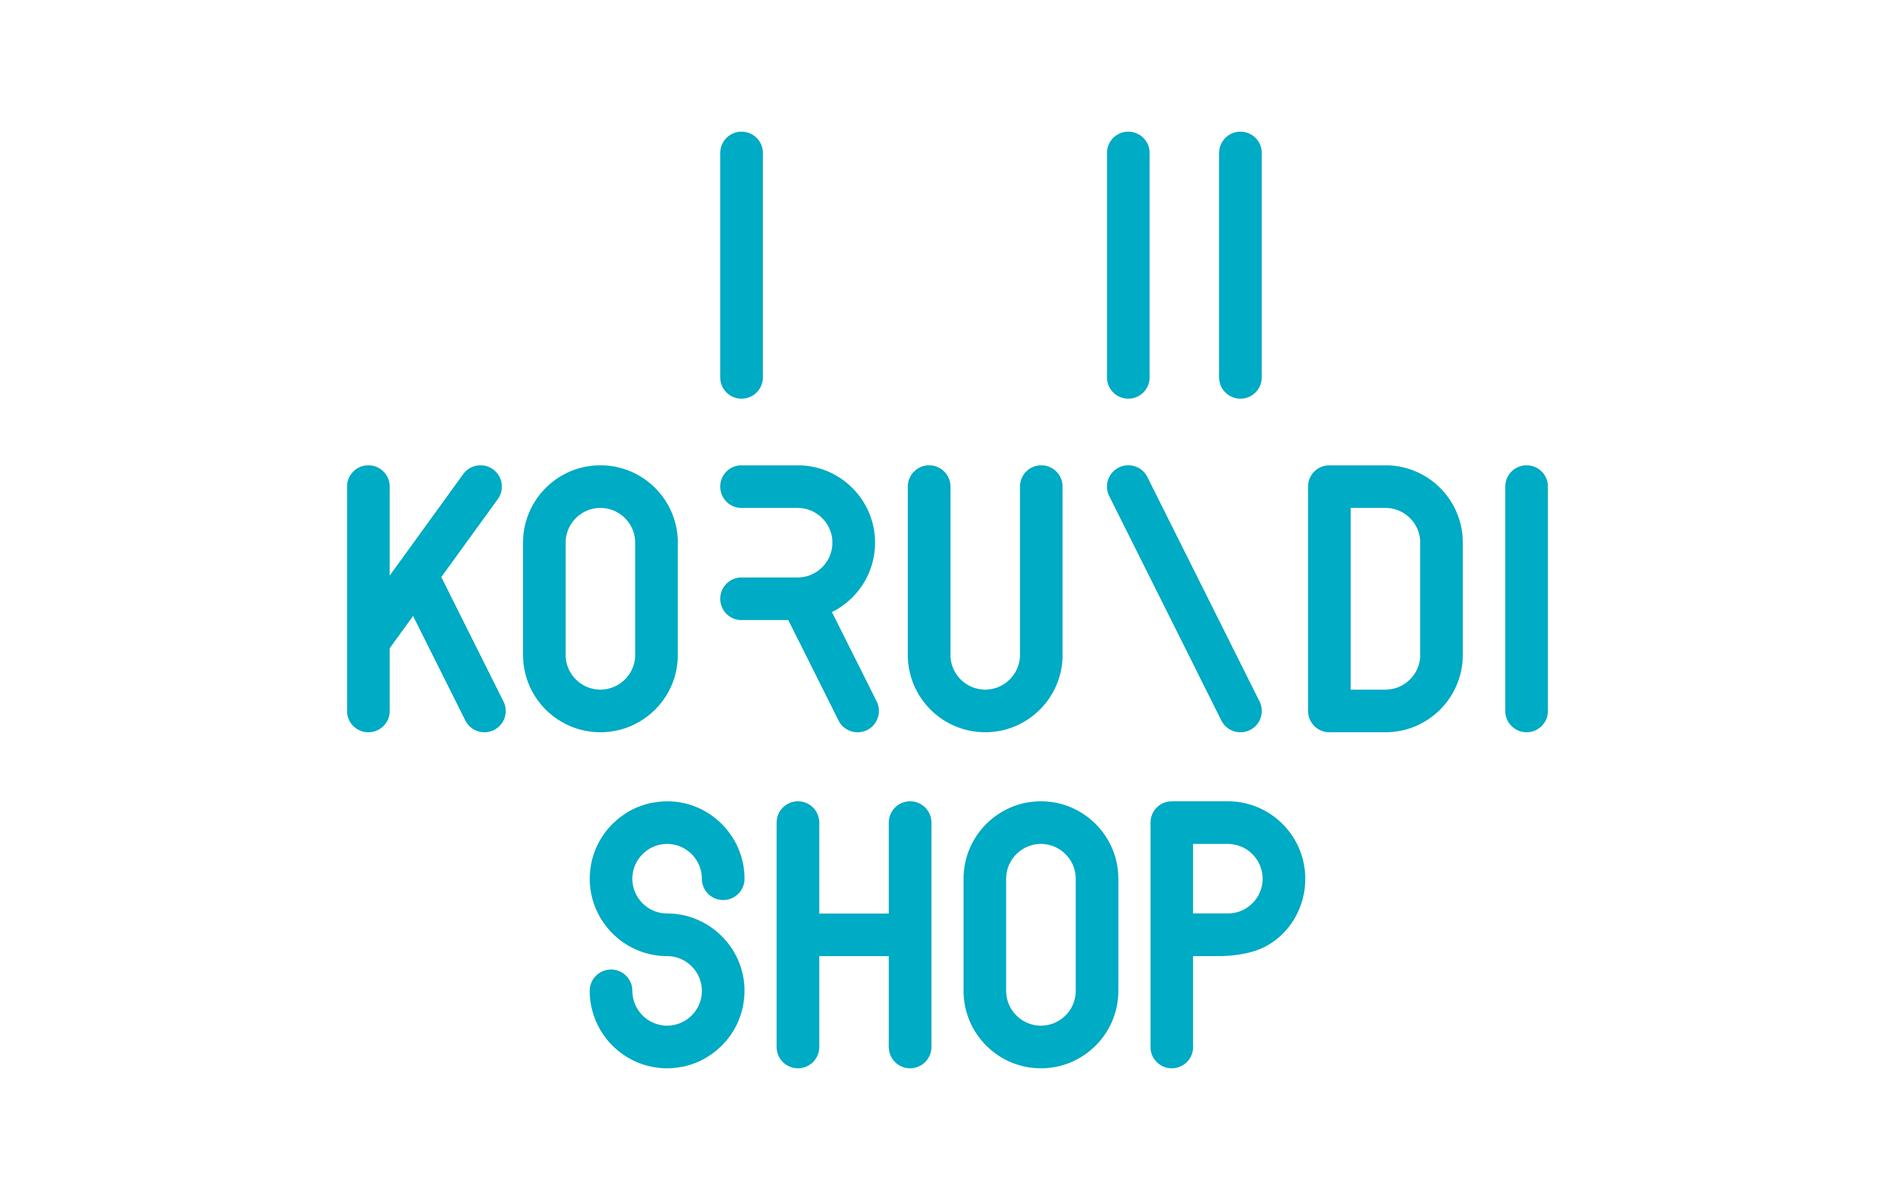 Korundi Shop